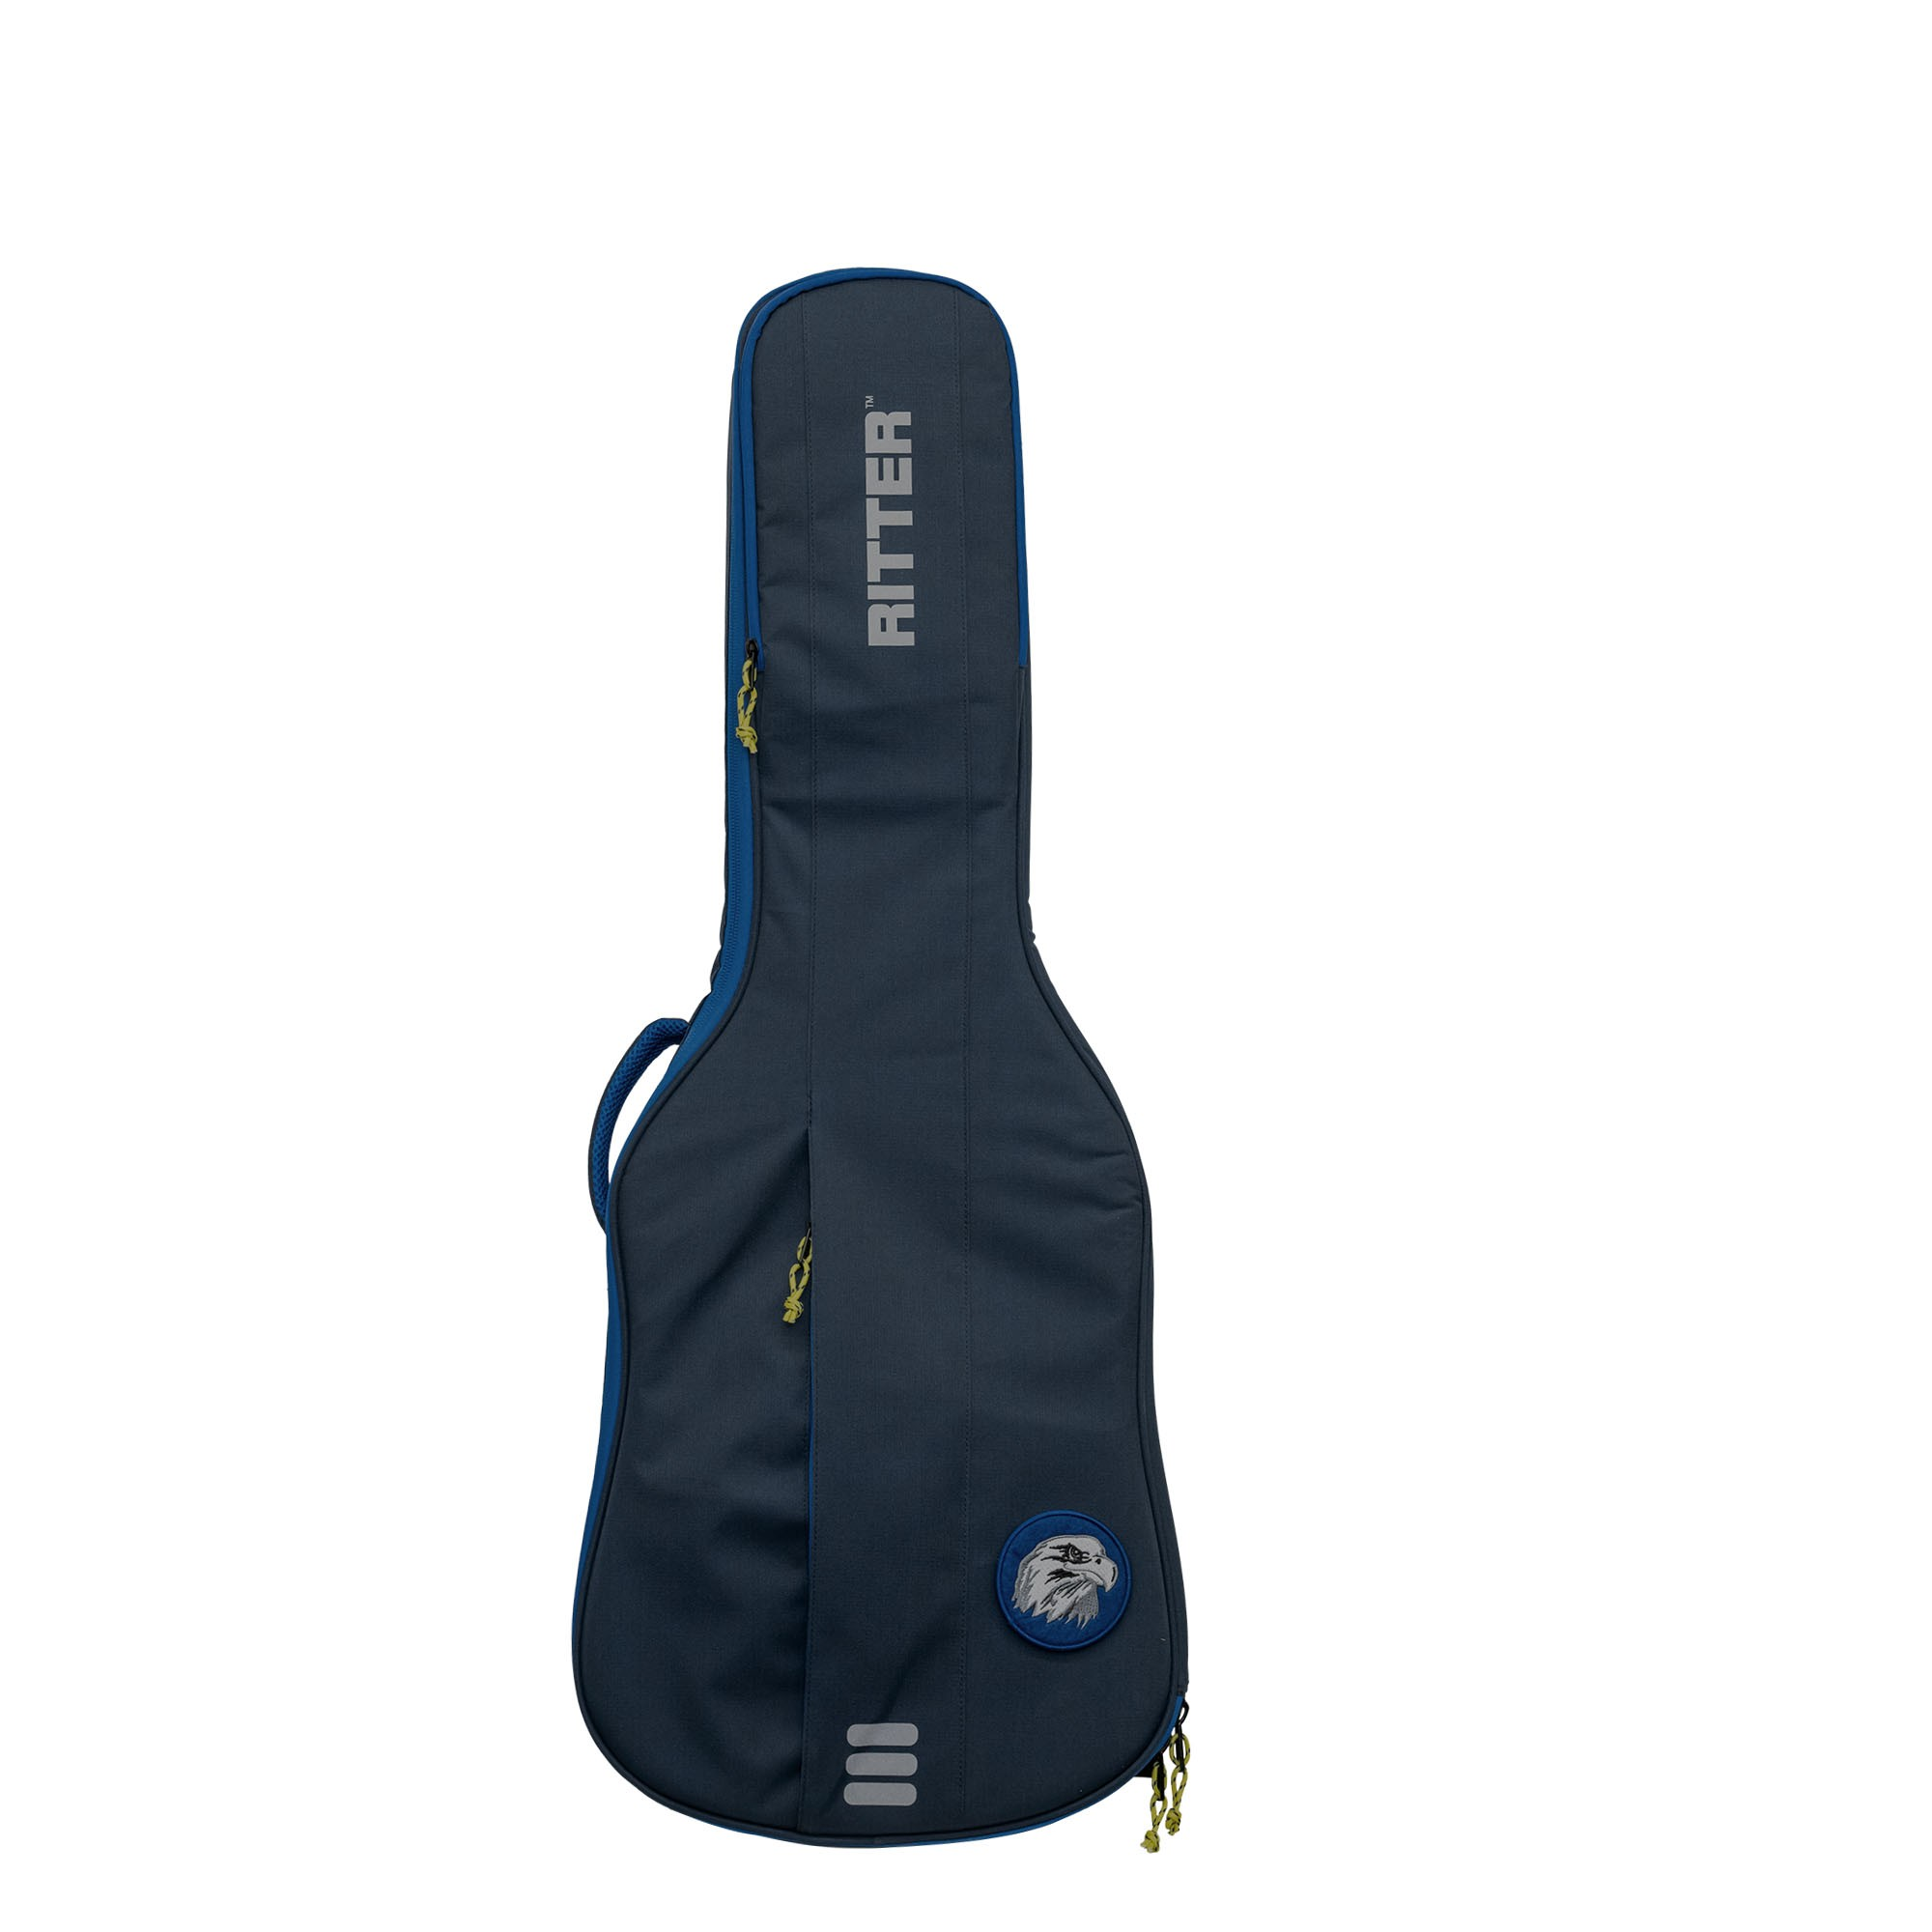 Ritter Carouge Electric Guitar Bag - Atlantic Blue (RGC3-E)